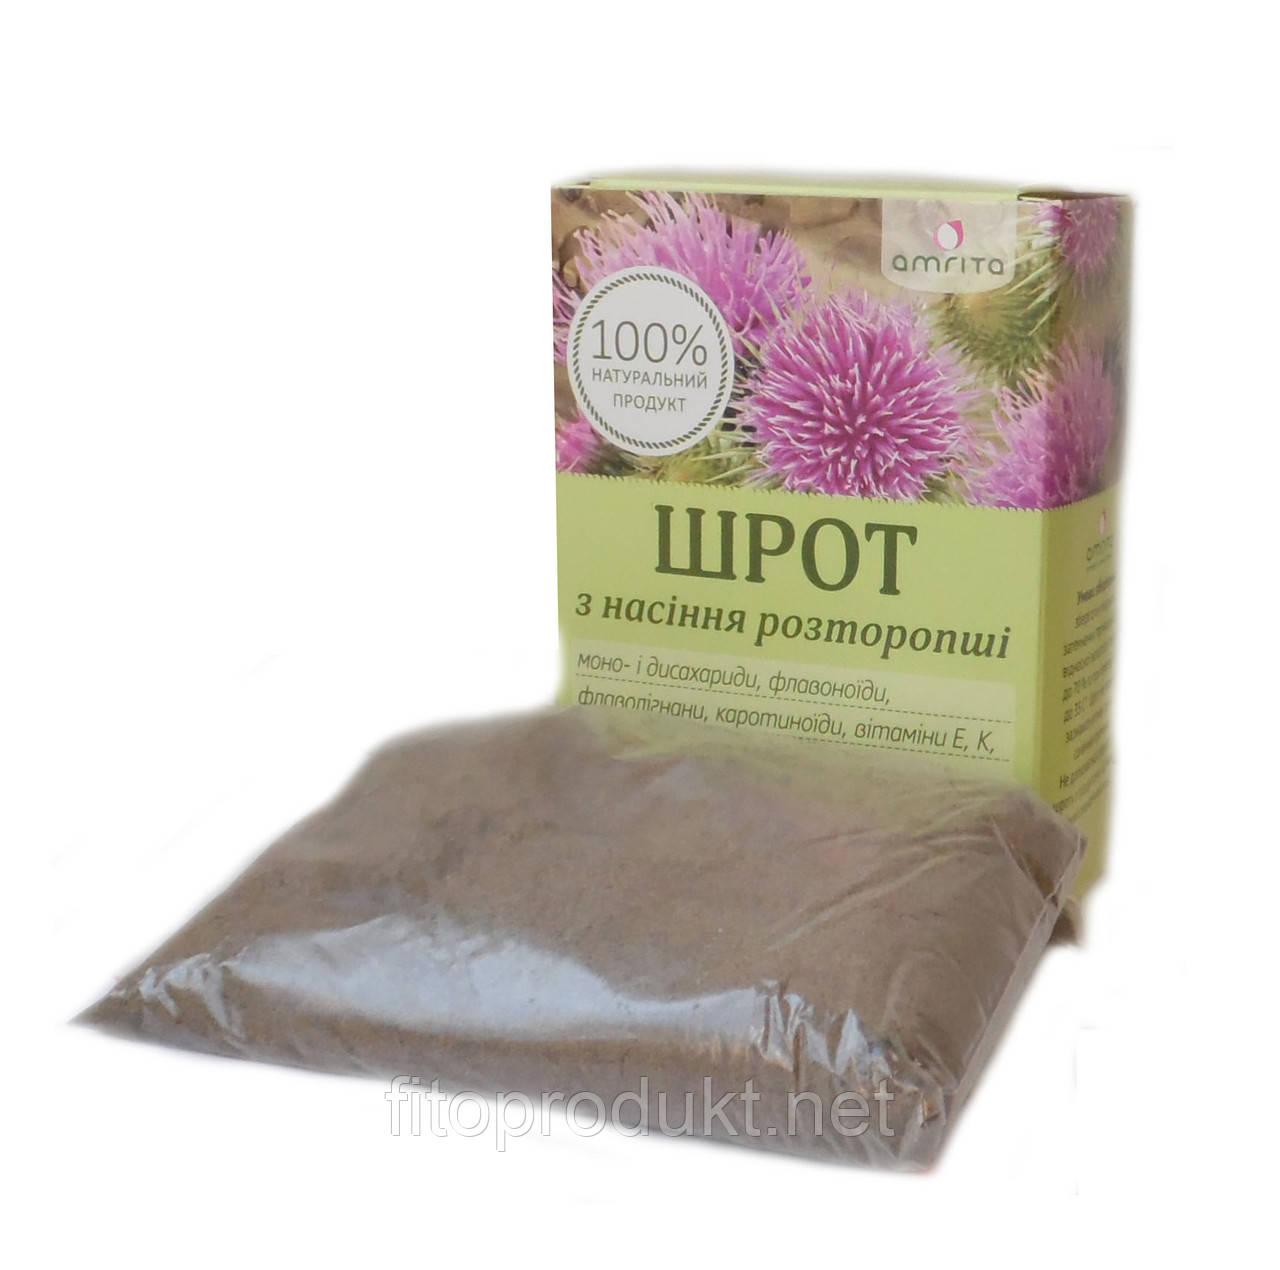 Шрот семян расторопши здоровье печени  200 г Амрита